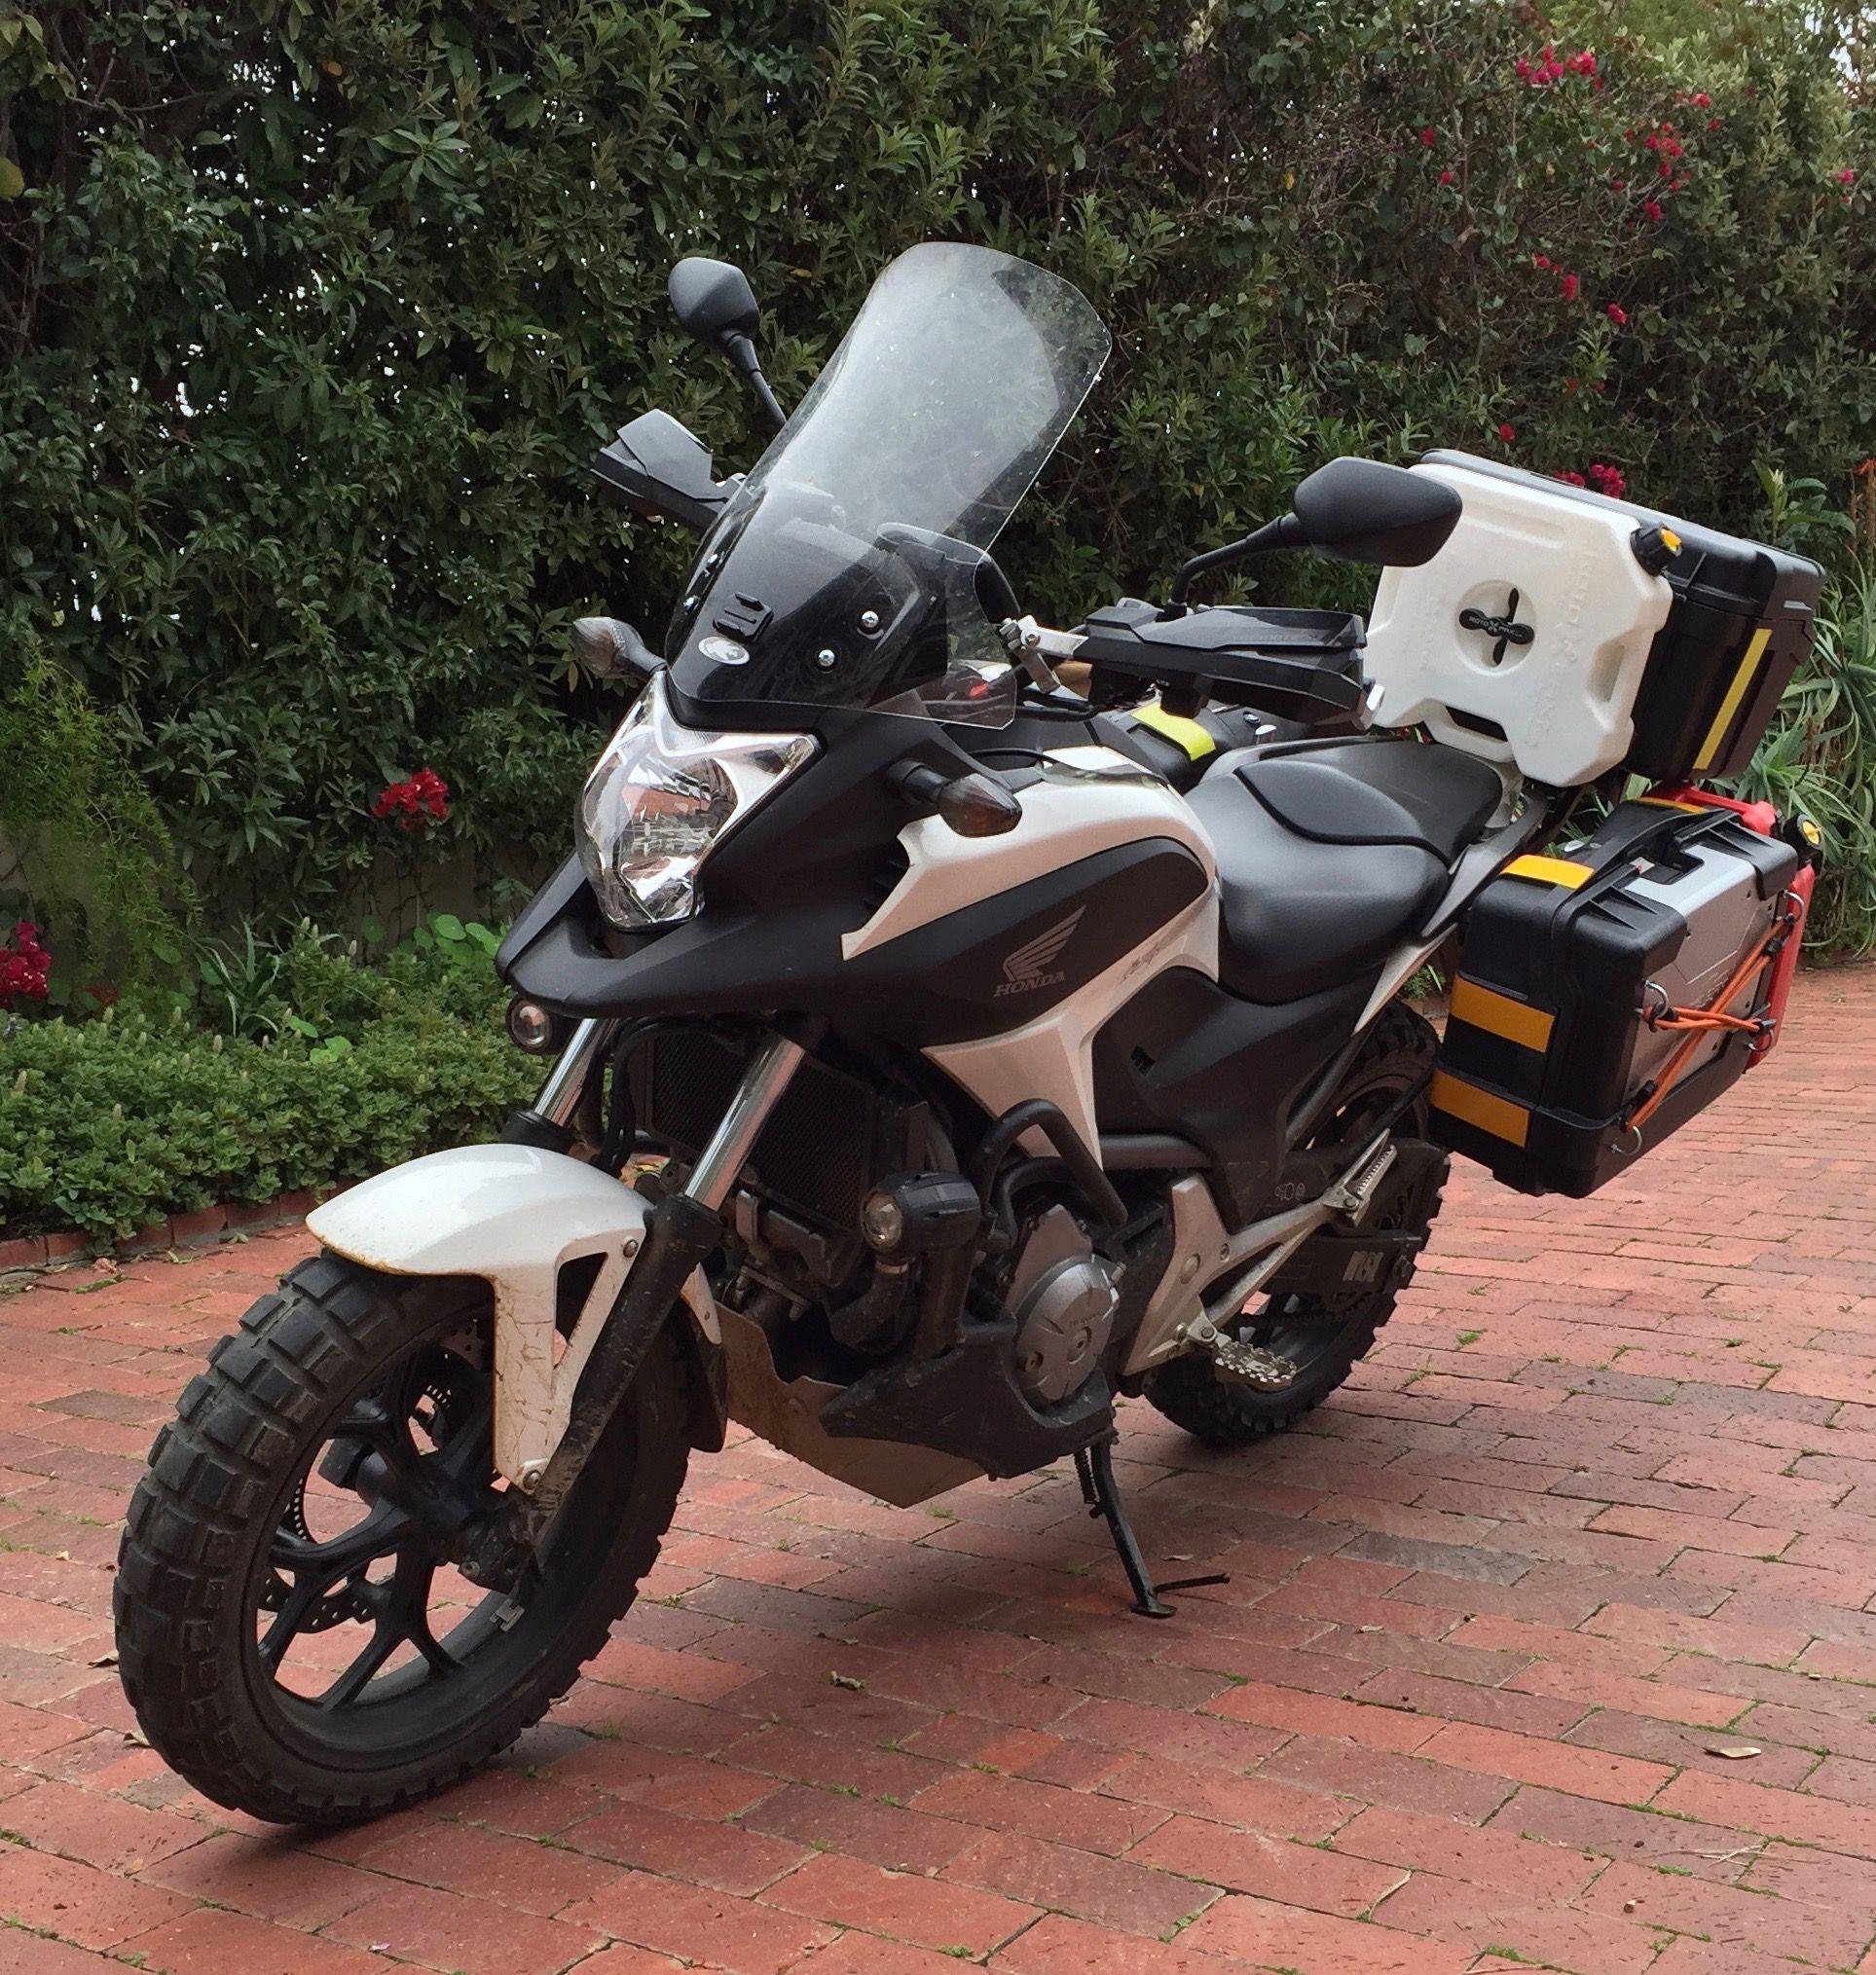 honda nc700x dct adventure biking cape town to kenya 3 | honda